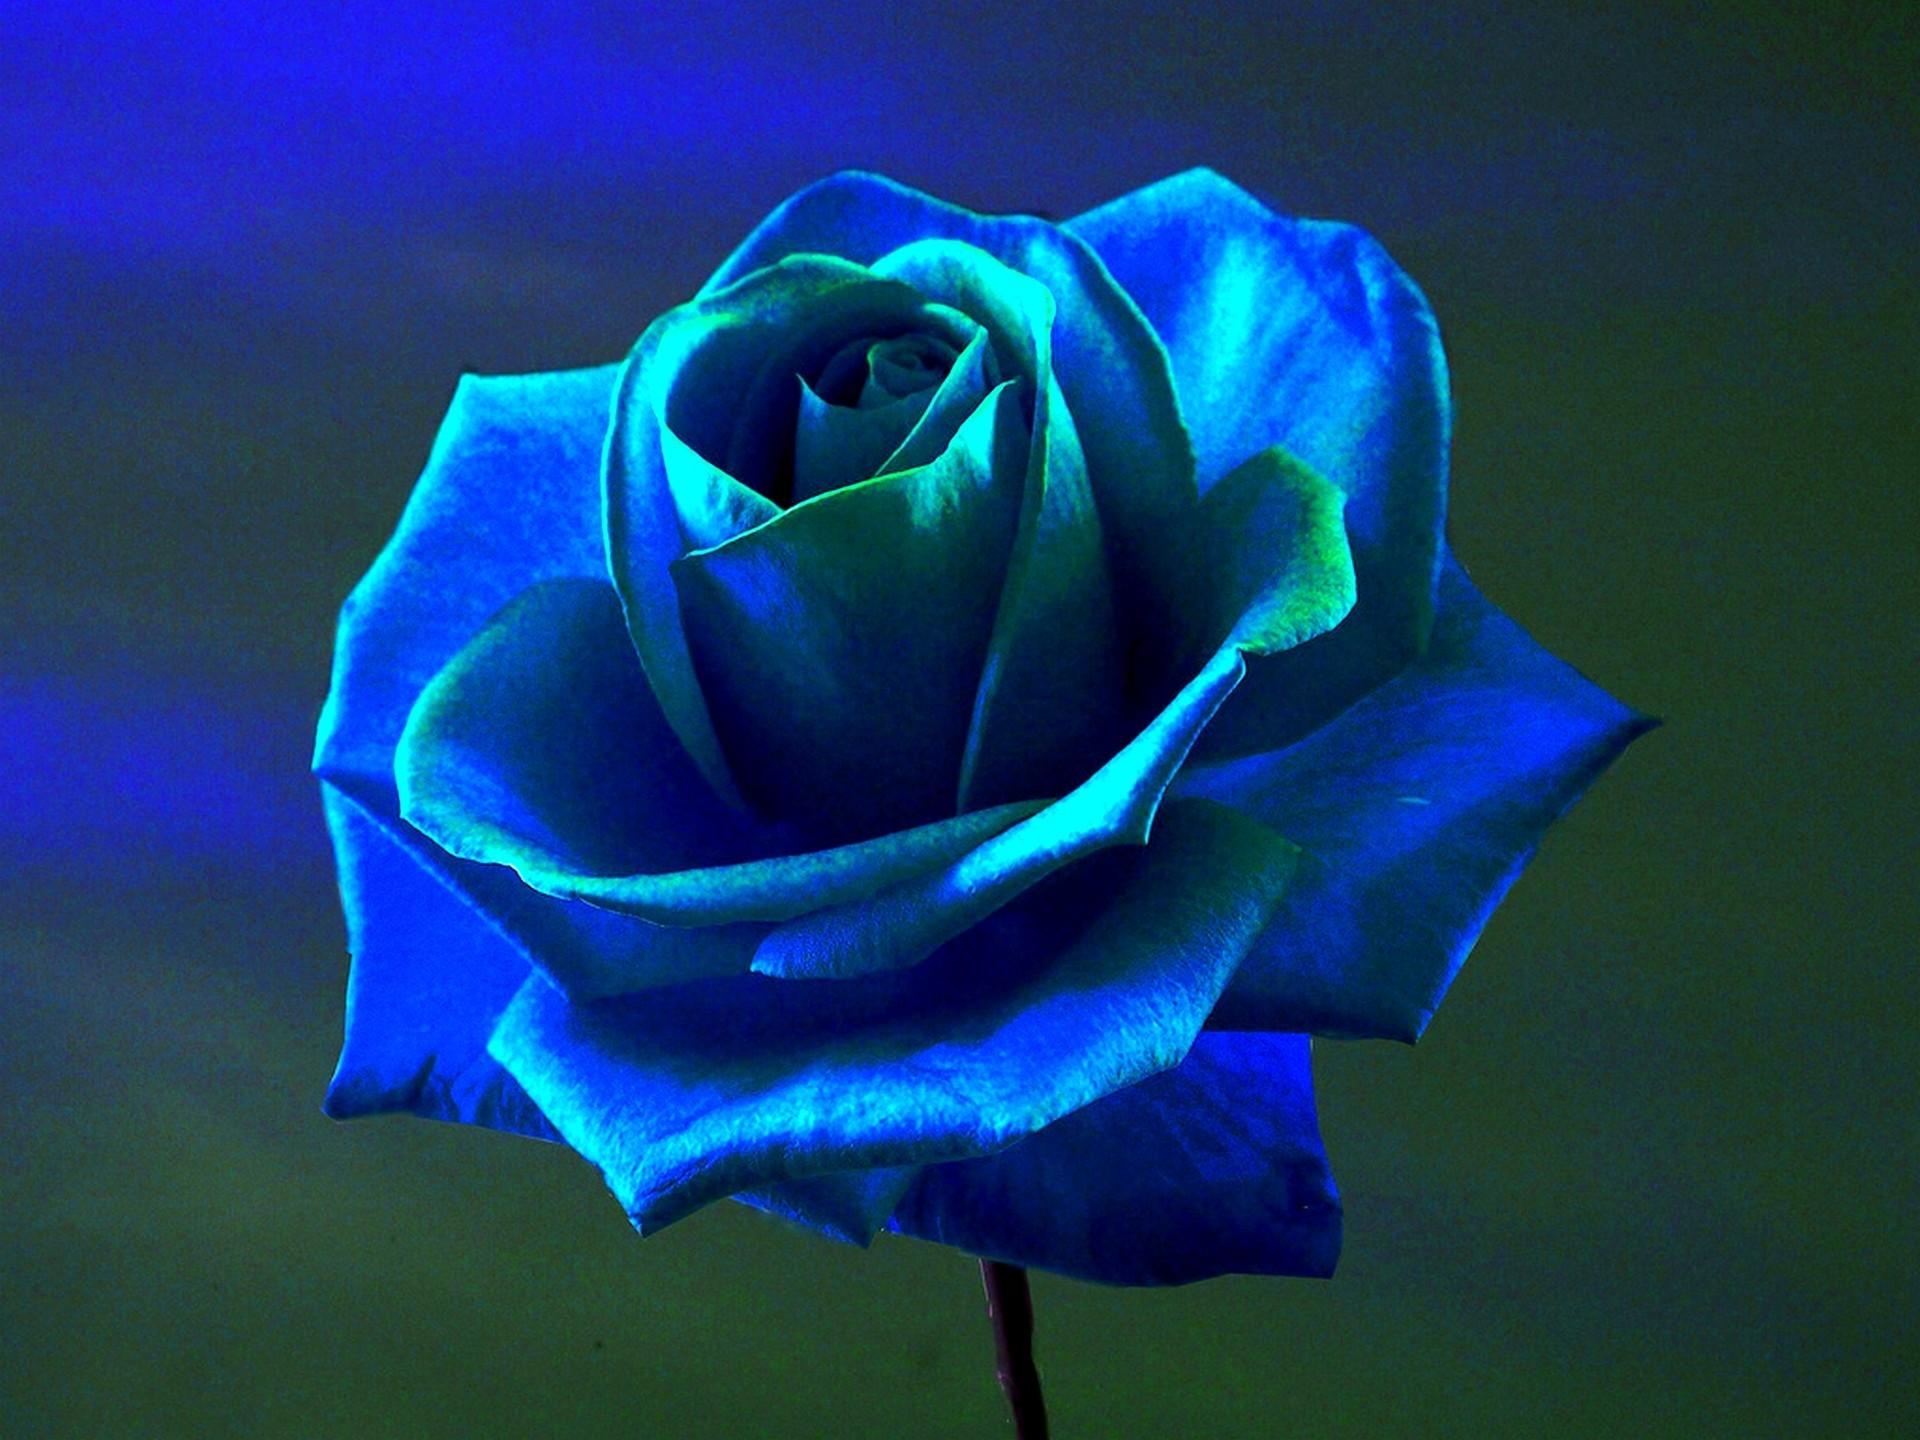 Blue Roses Wallpaper (58+ Images